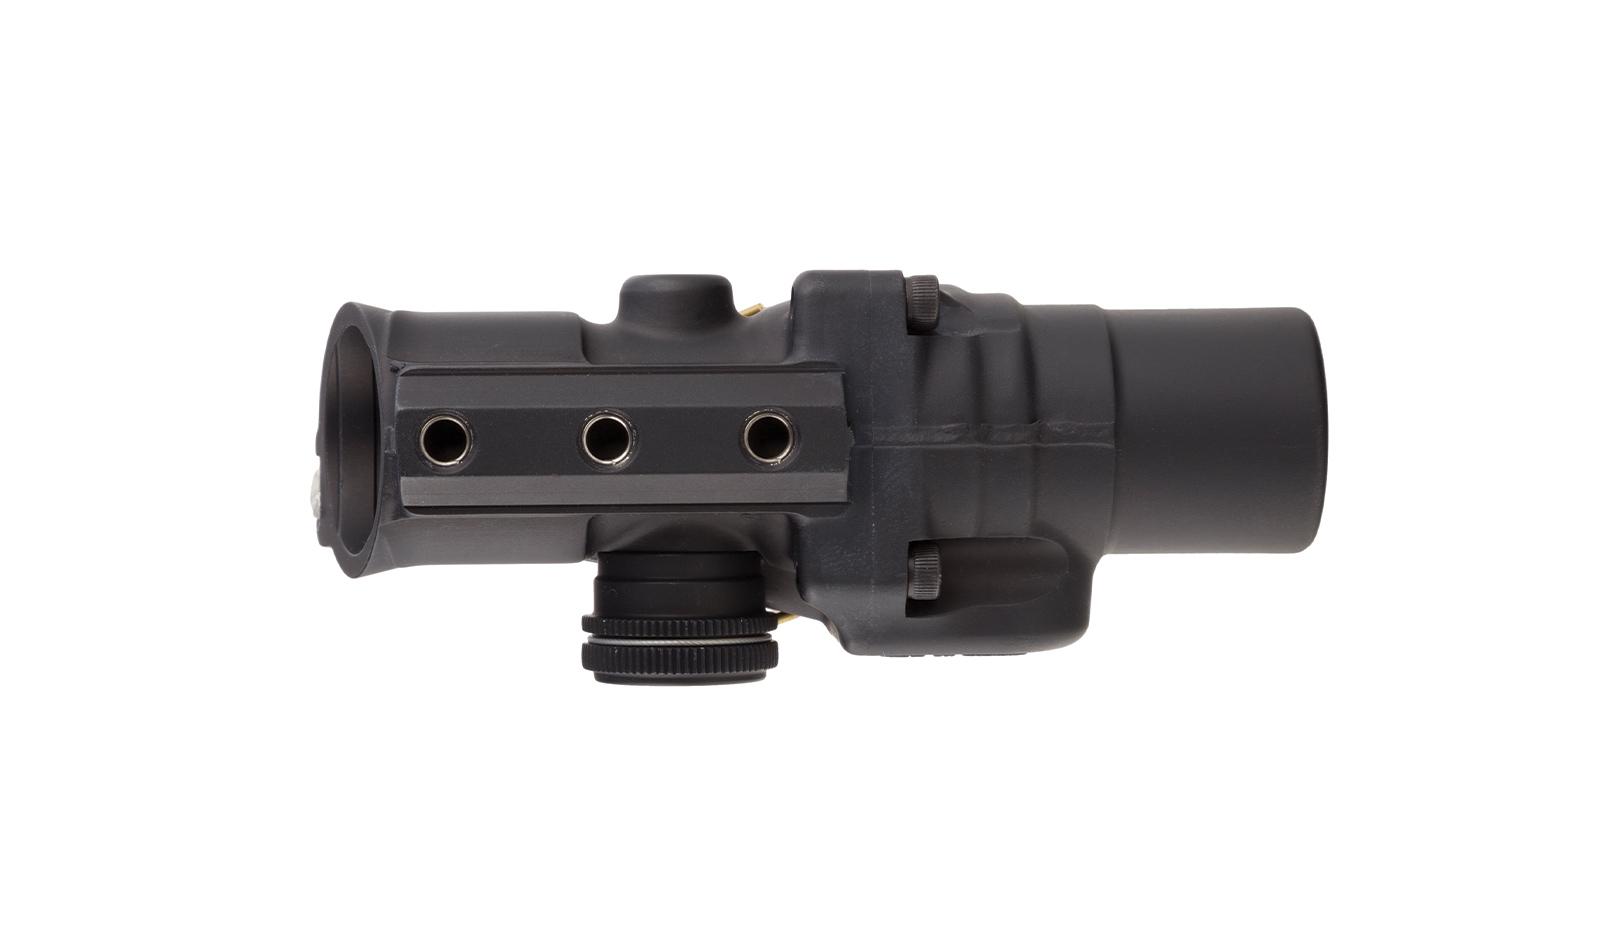 TA44-C-400241 angle 10